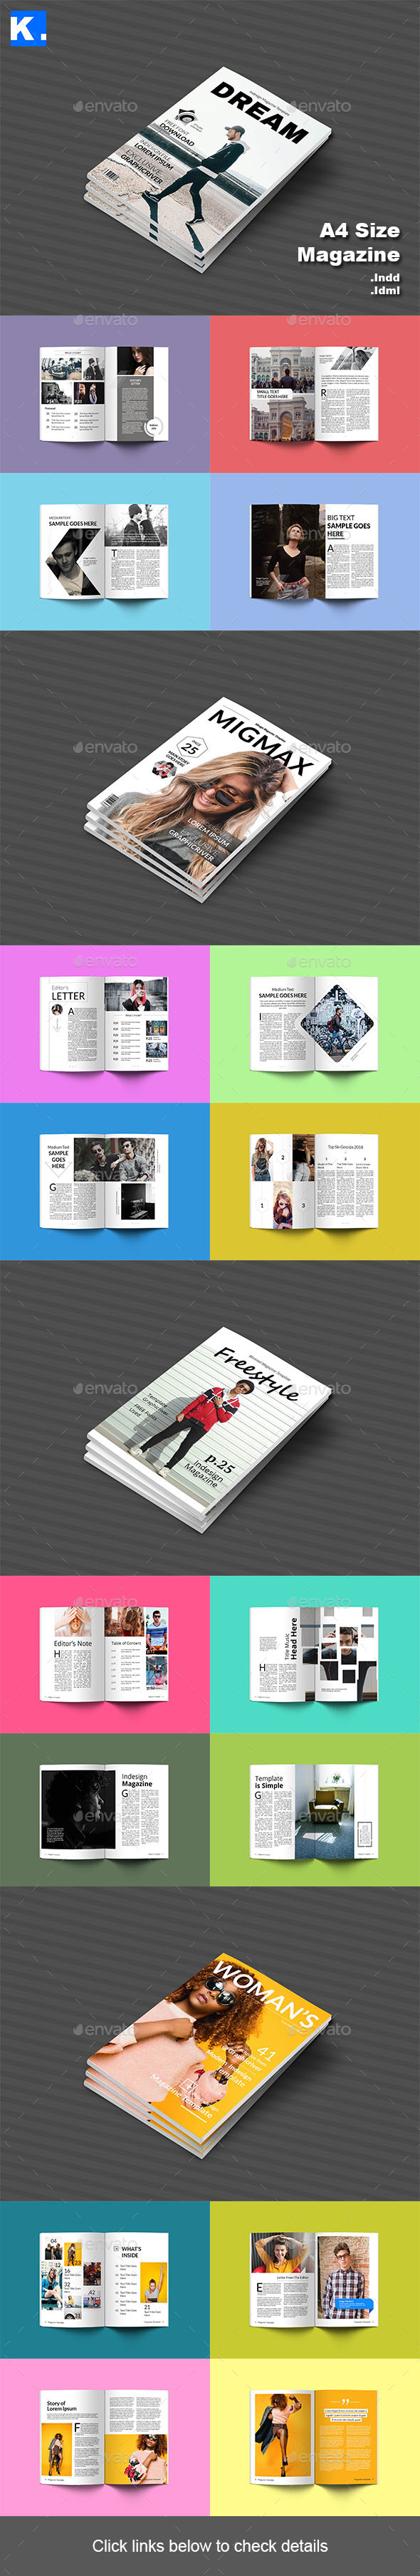 A4 Magazine Bundle 2 - Magazines Print Templates